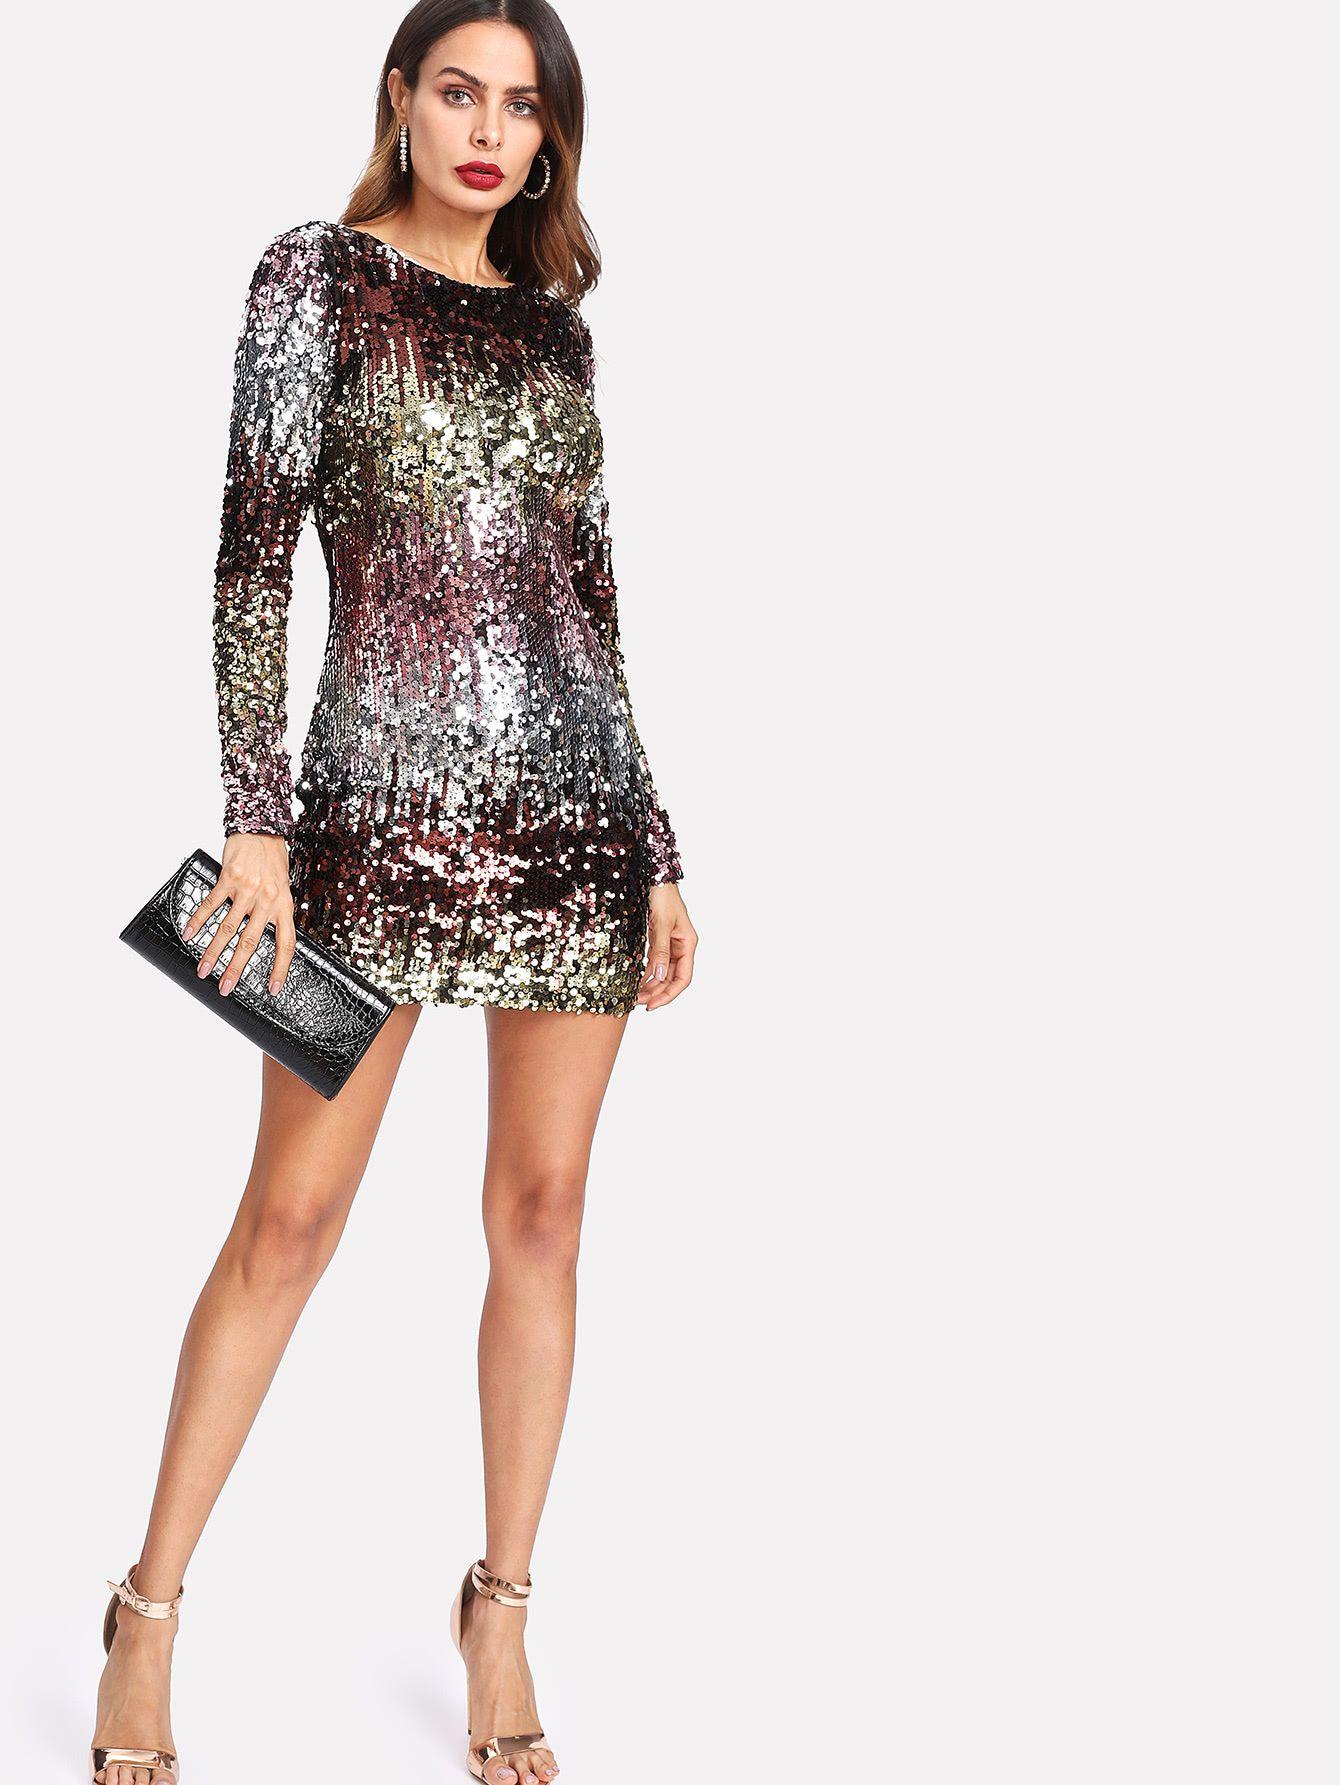 3c75747027 Shop Iridescent Sequin Dress online. SheIn offers Iridescent Sequin Dress &  more to fit your fashionable needs.